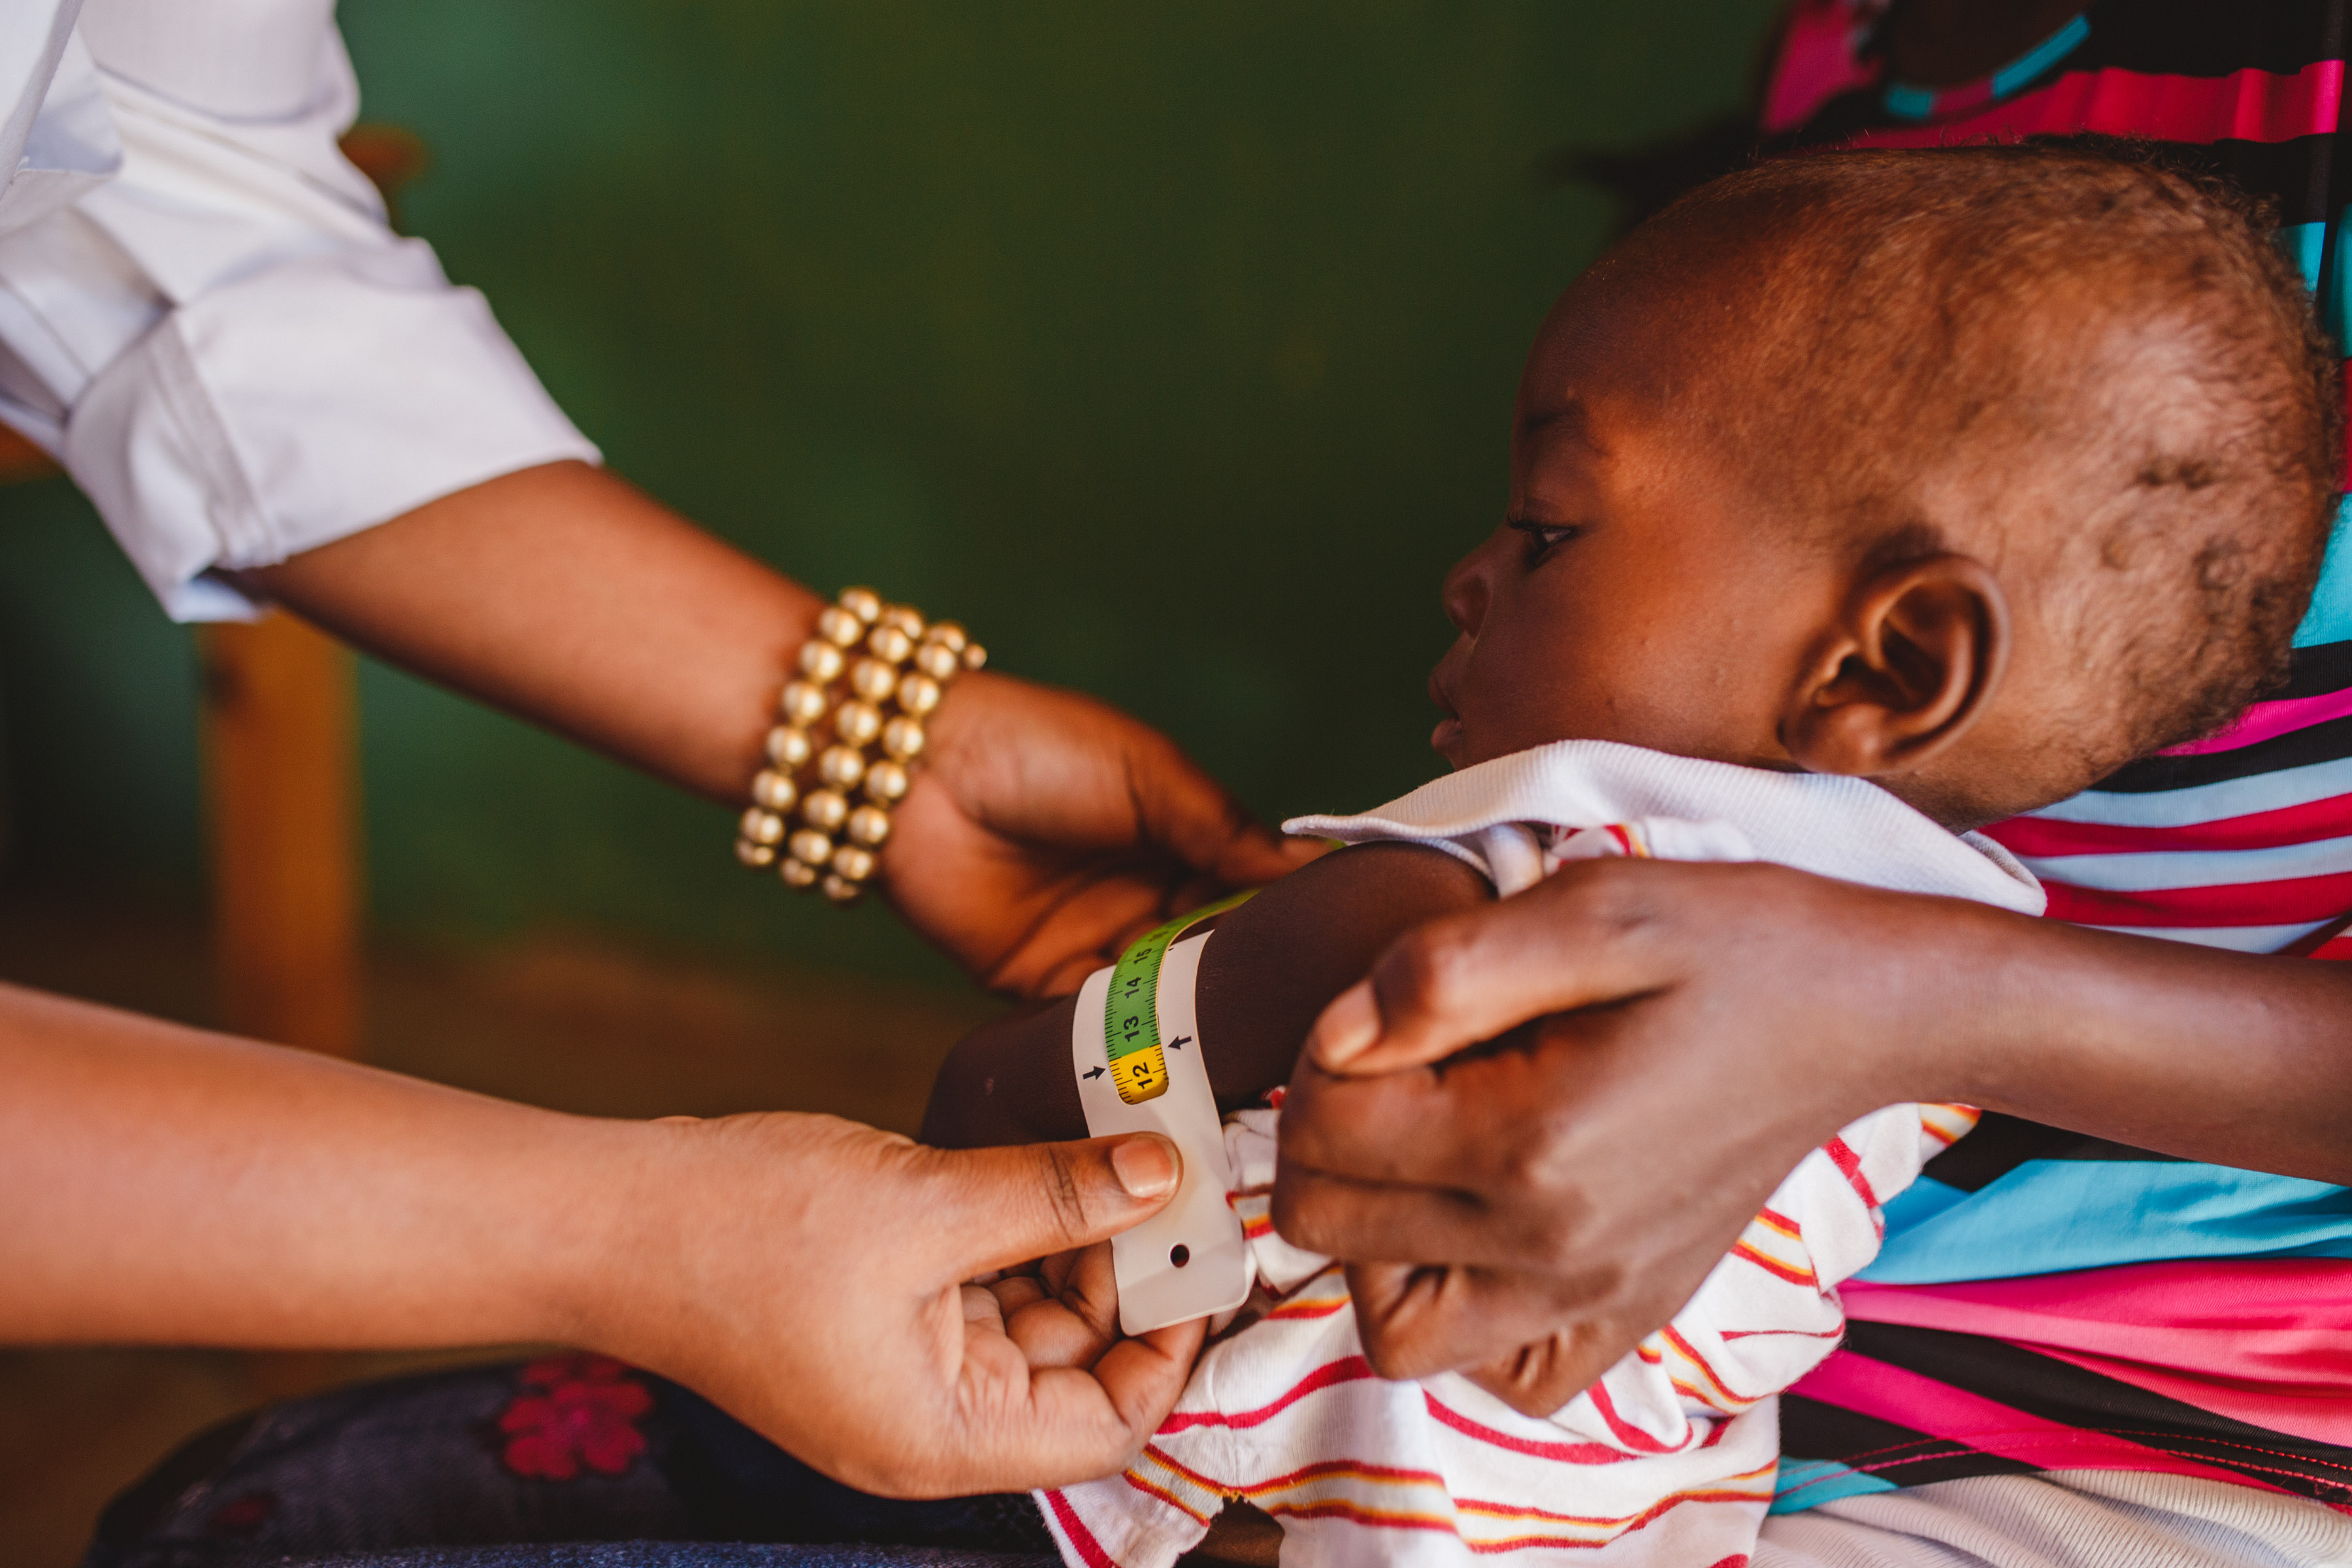 Child at malnutrition clinic